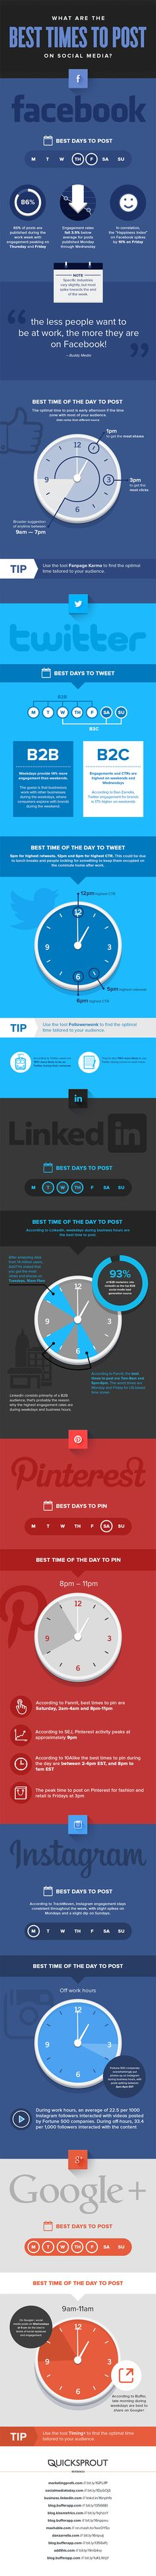 Mejores horarios para publicar en redes sociales #socialmedia #social #twitter    #facebook #linkedin